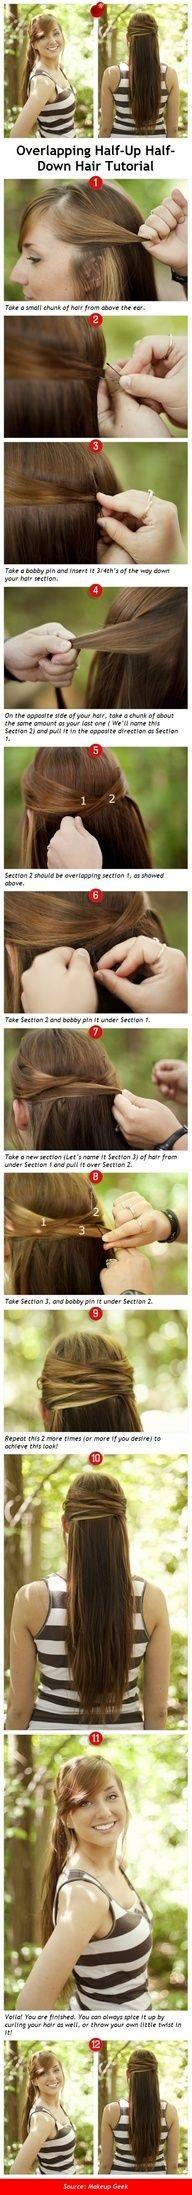 Overlapping Half-Up Half-Down Hair Tutorial - hair-sublime.com